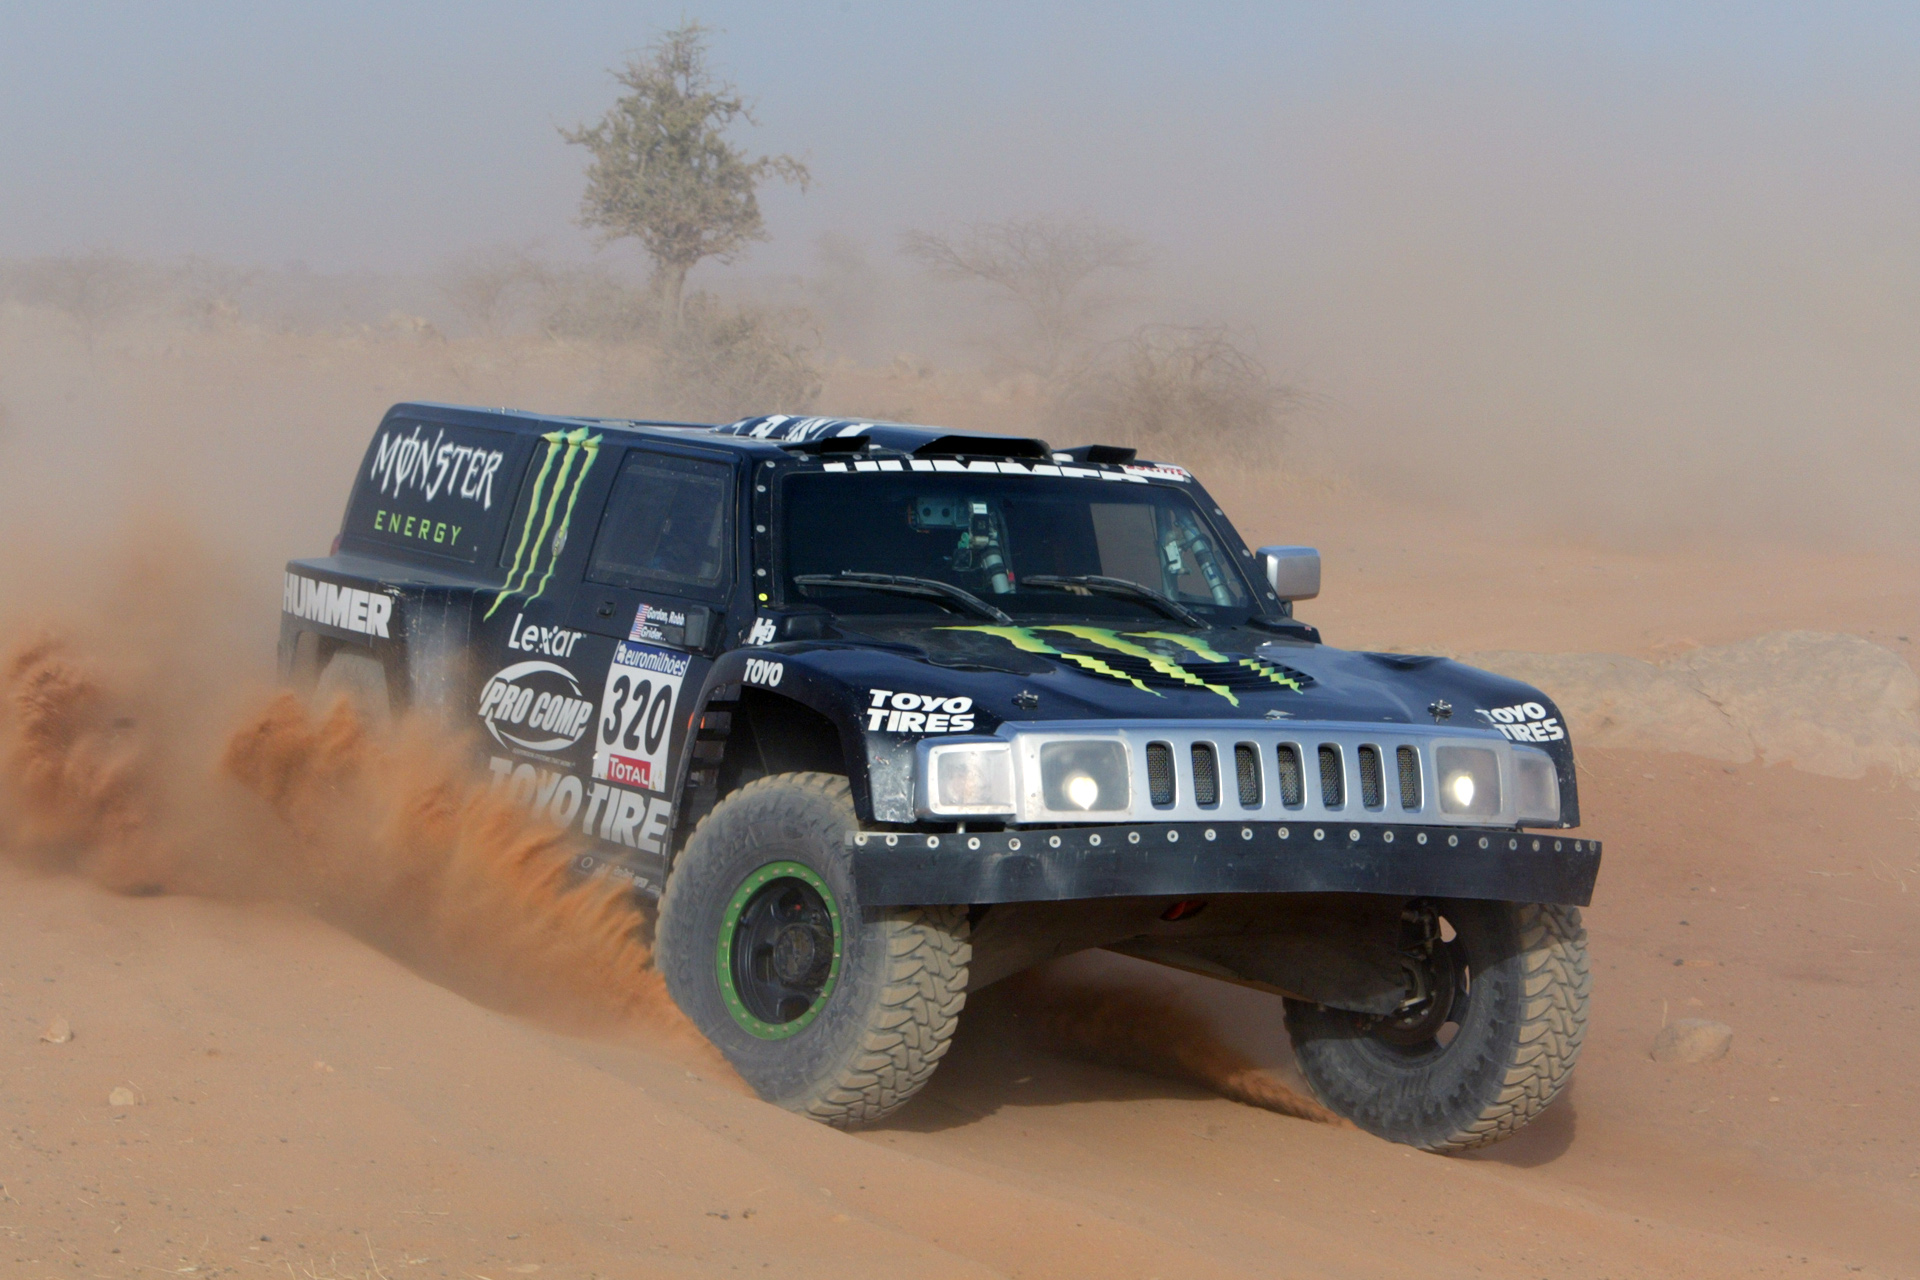 Hummer H3 Dakar Photos Photogallery With 13 Pics